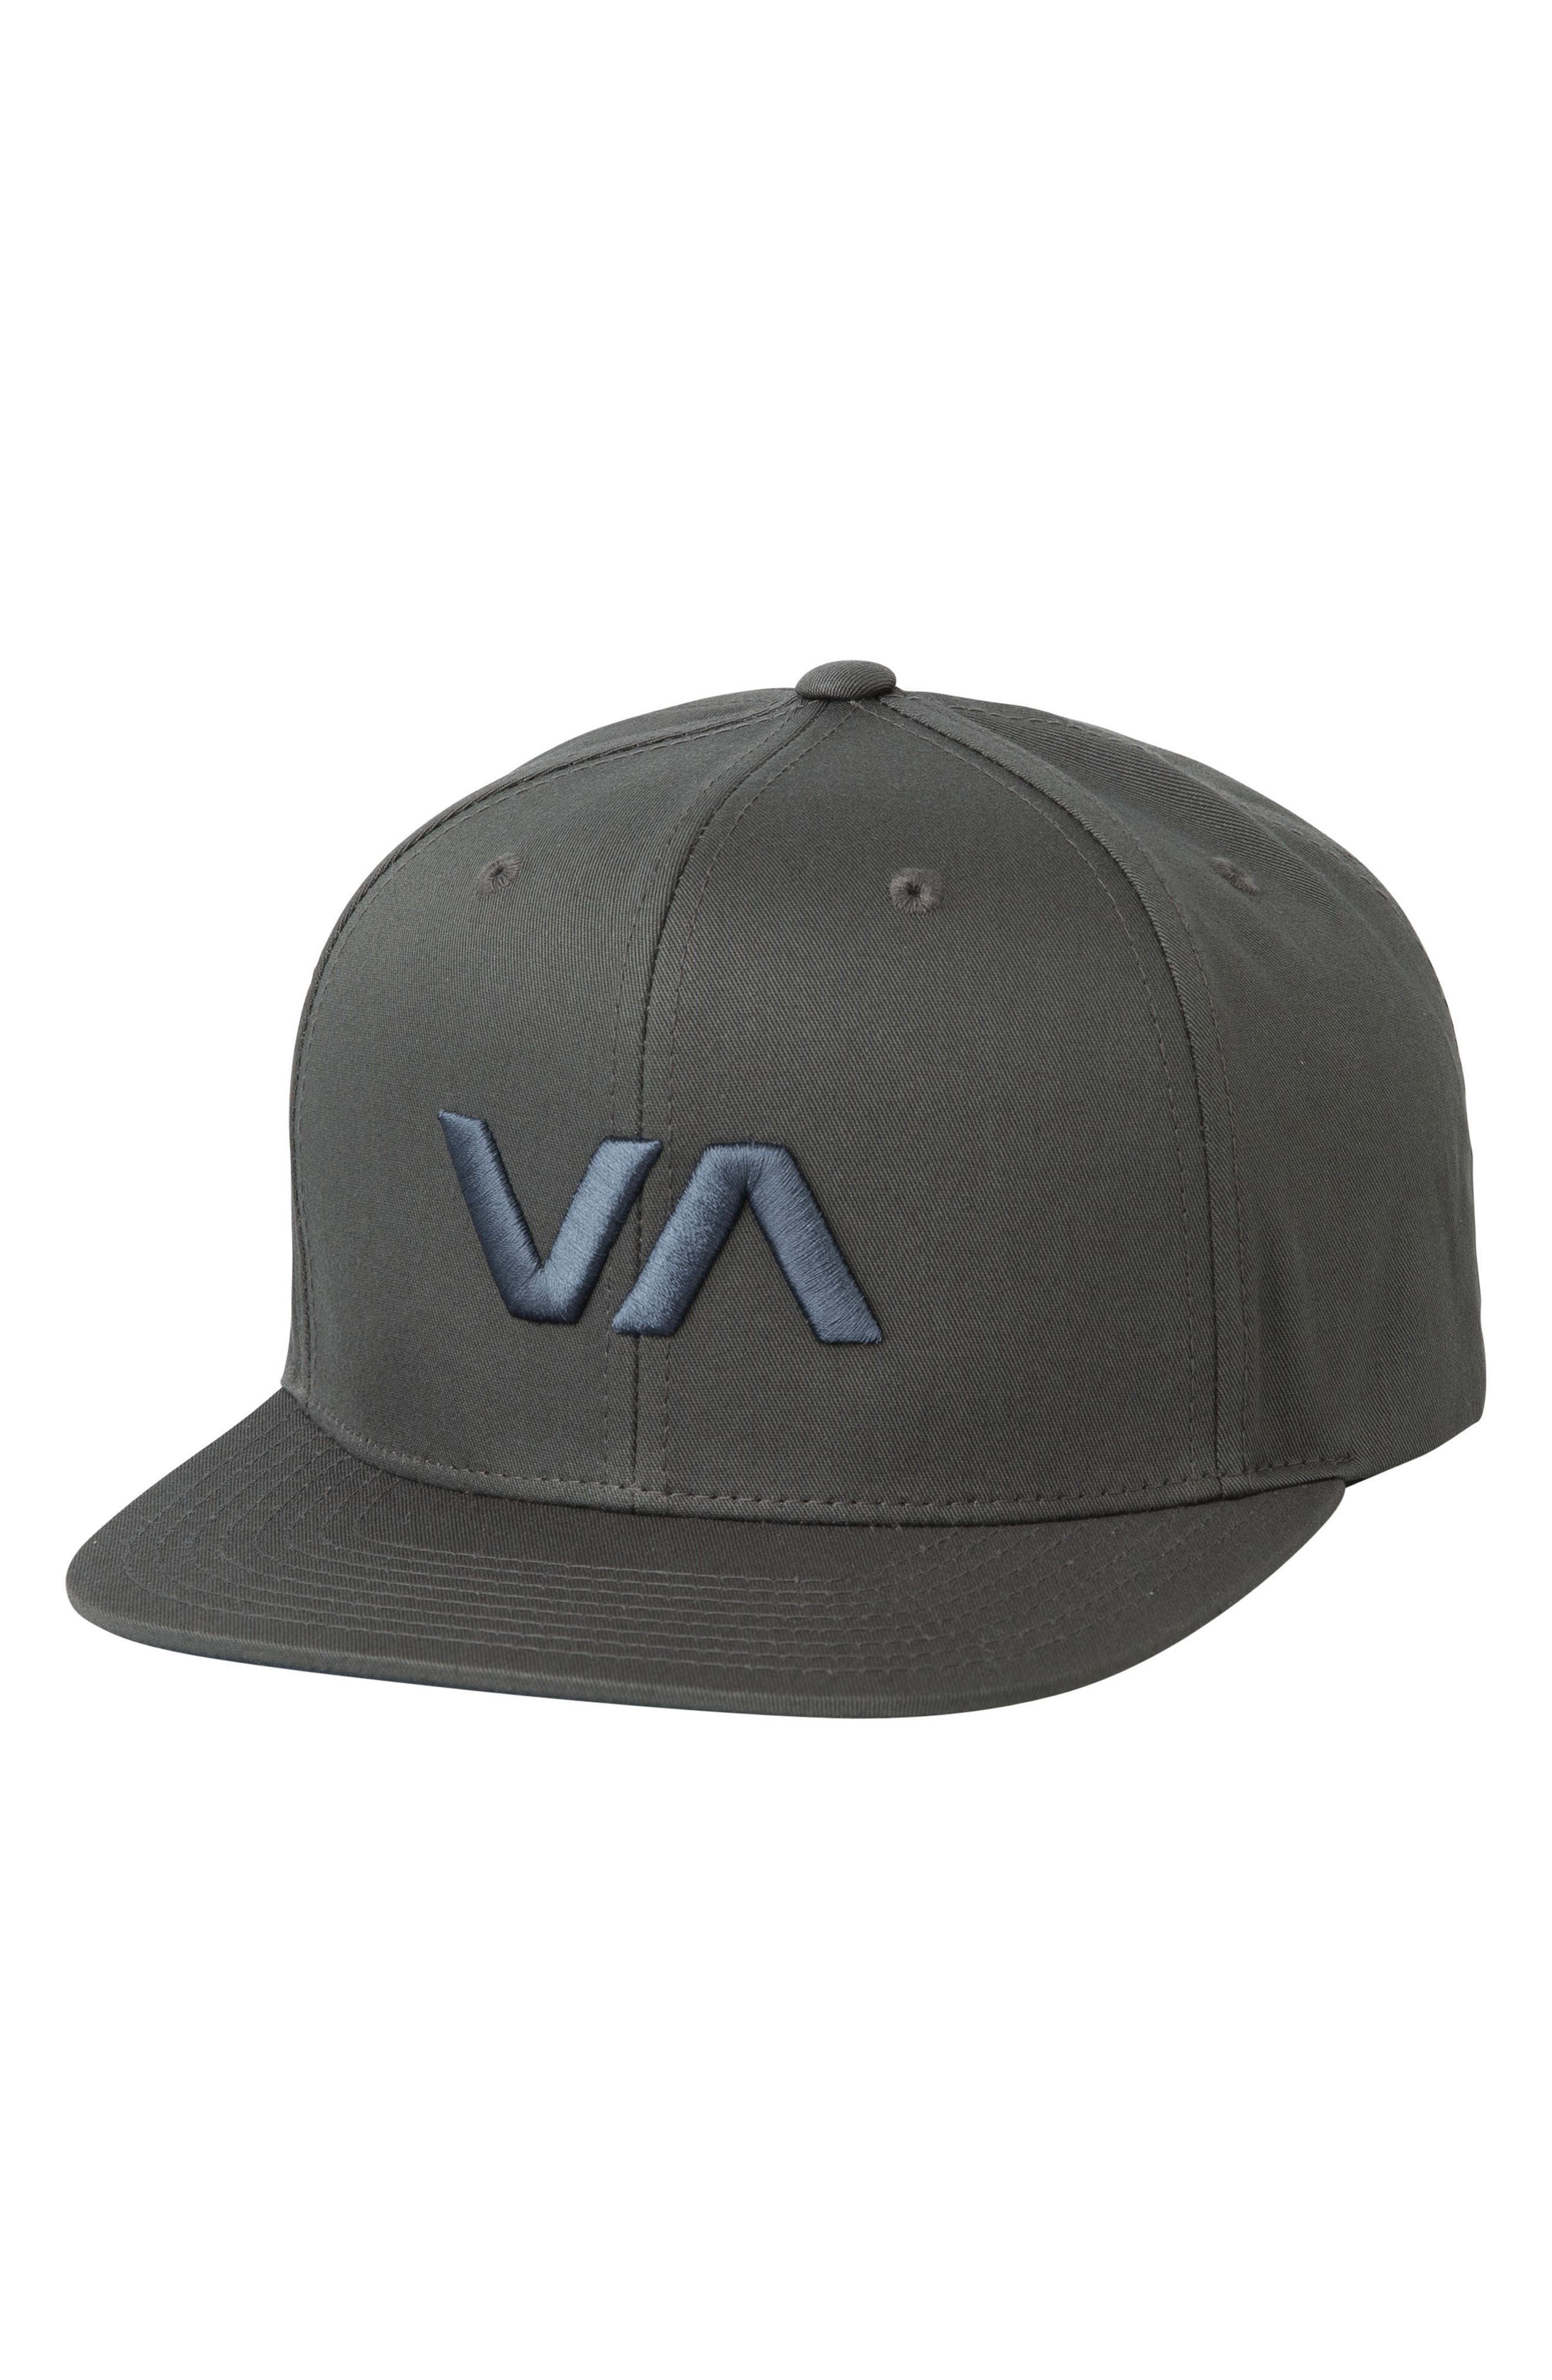 'VA' Snapback Hat,                         Main,                         color, Grey Blue